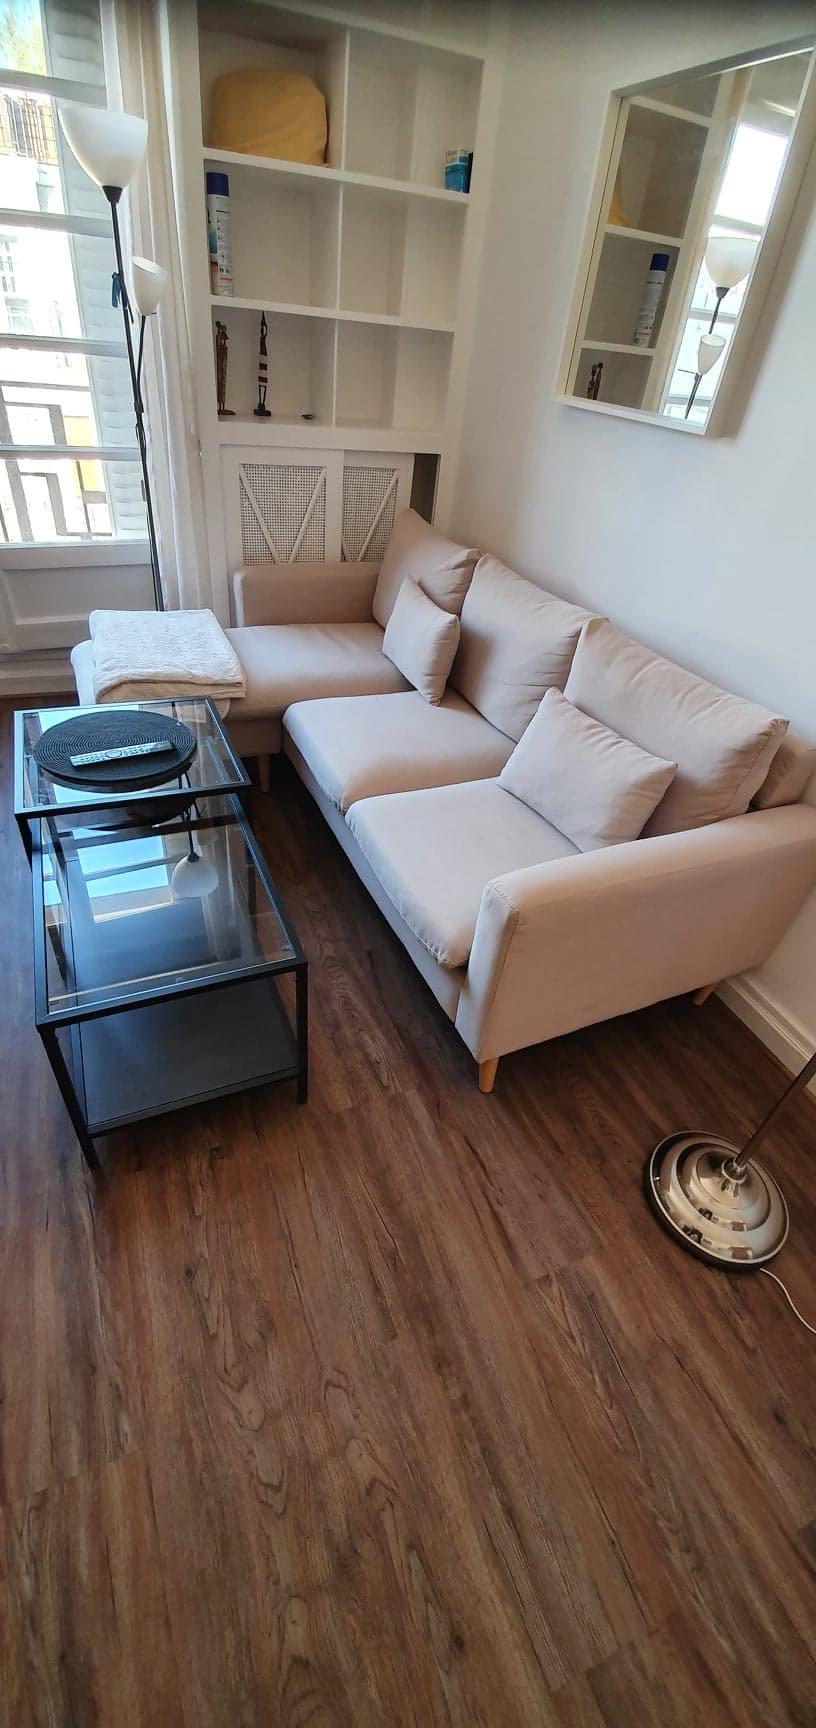 Trocadéro - Grand studio meublé 37m²